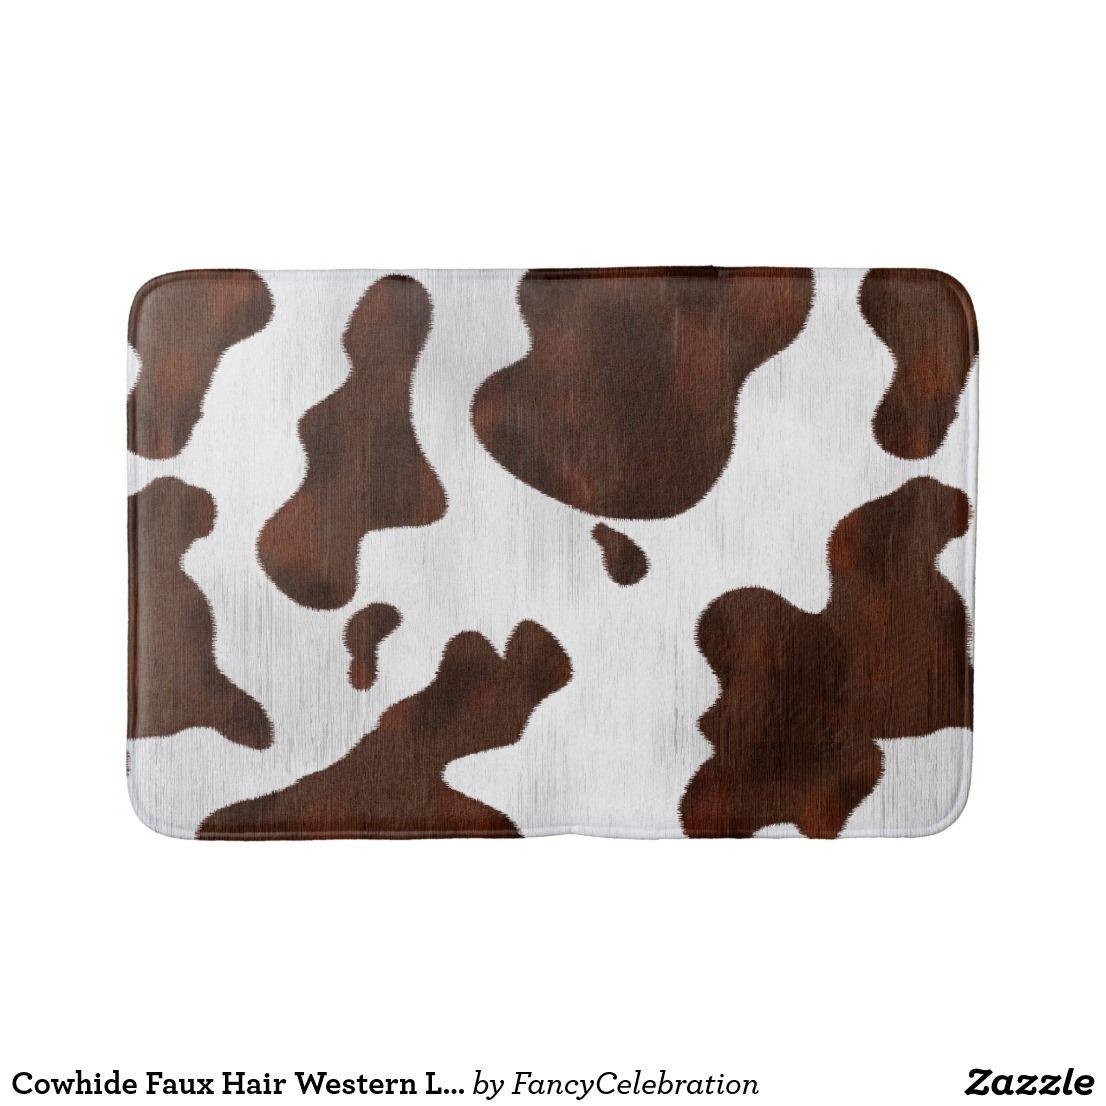 Cowhide Faux Hair Western Leather Spotted Pattern Bath Mat Zazzle Com Patterned Bath Mats Spots Pattern Western Leather